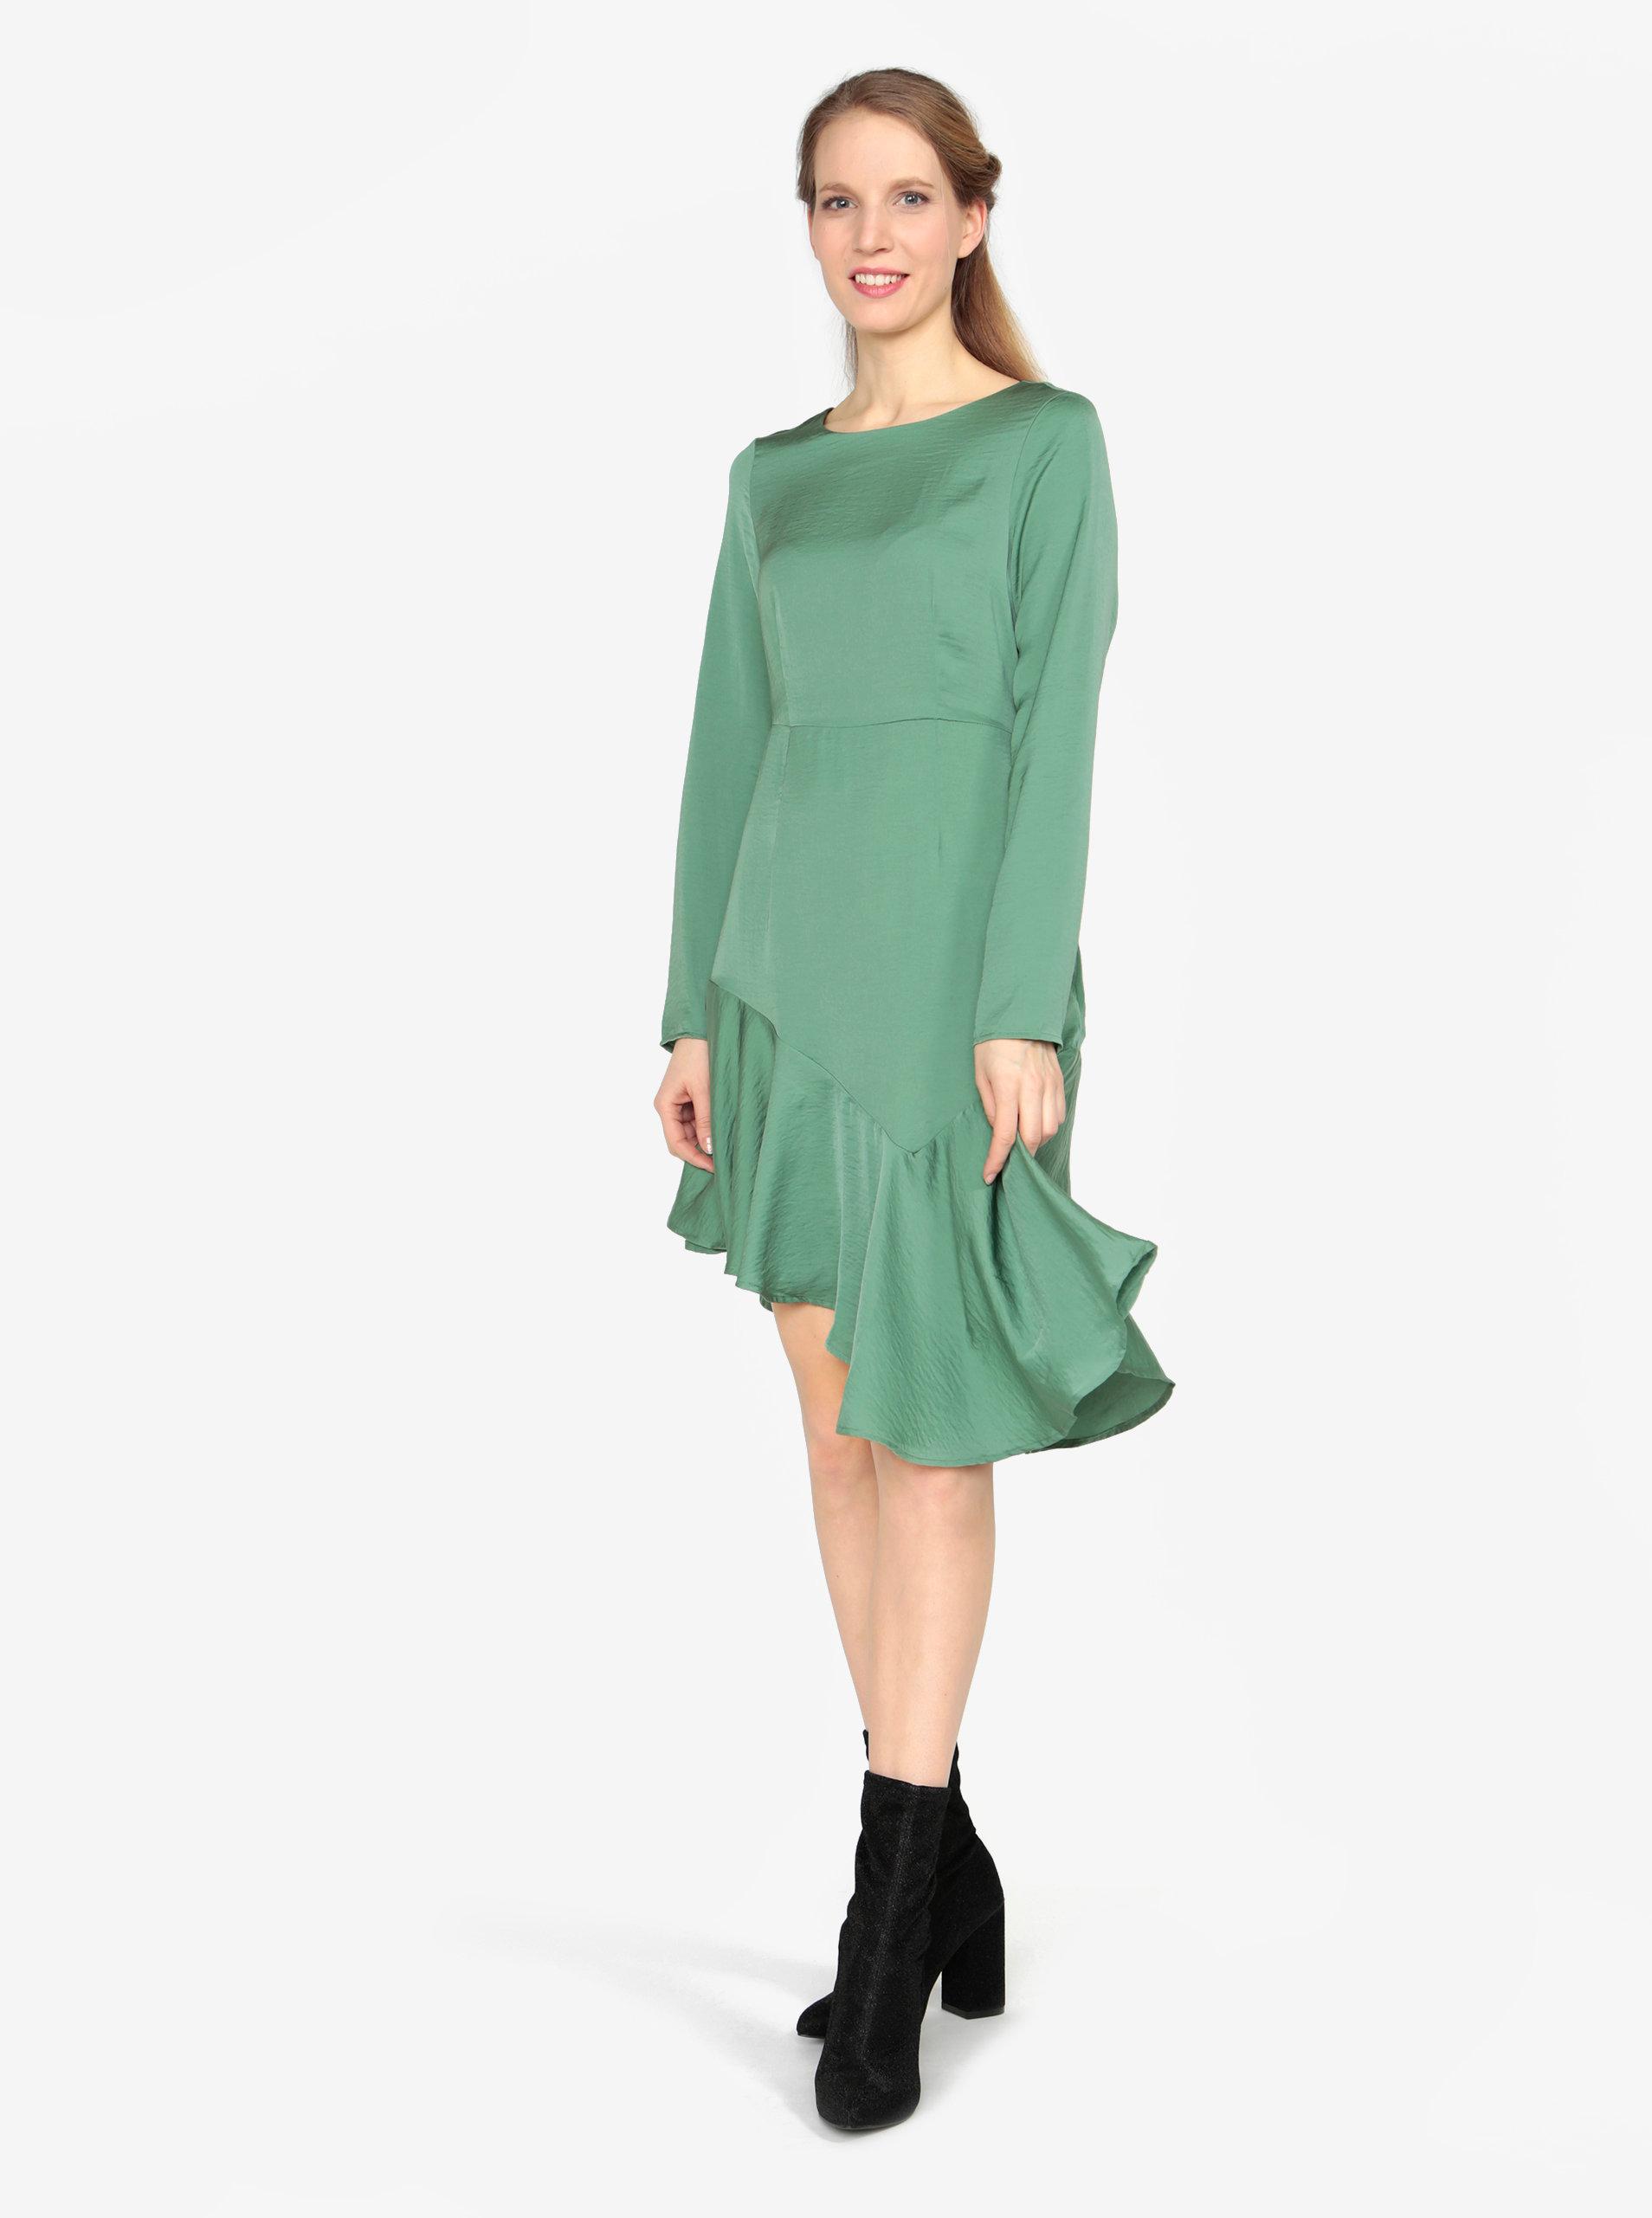 00315cf6c259 Zelené asymetrické šaty s dlouhým rukávem VERO MODA Elsa ...